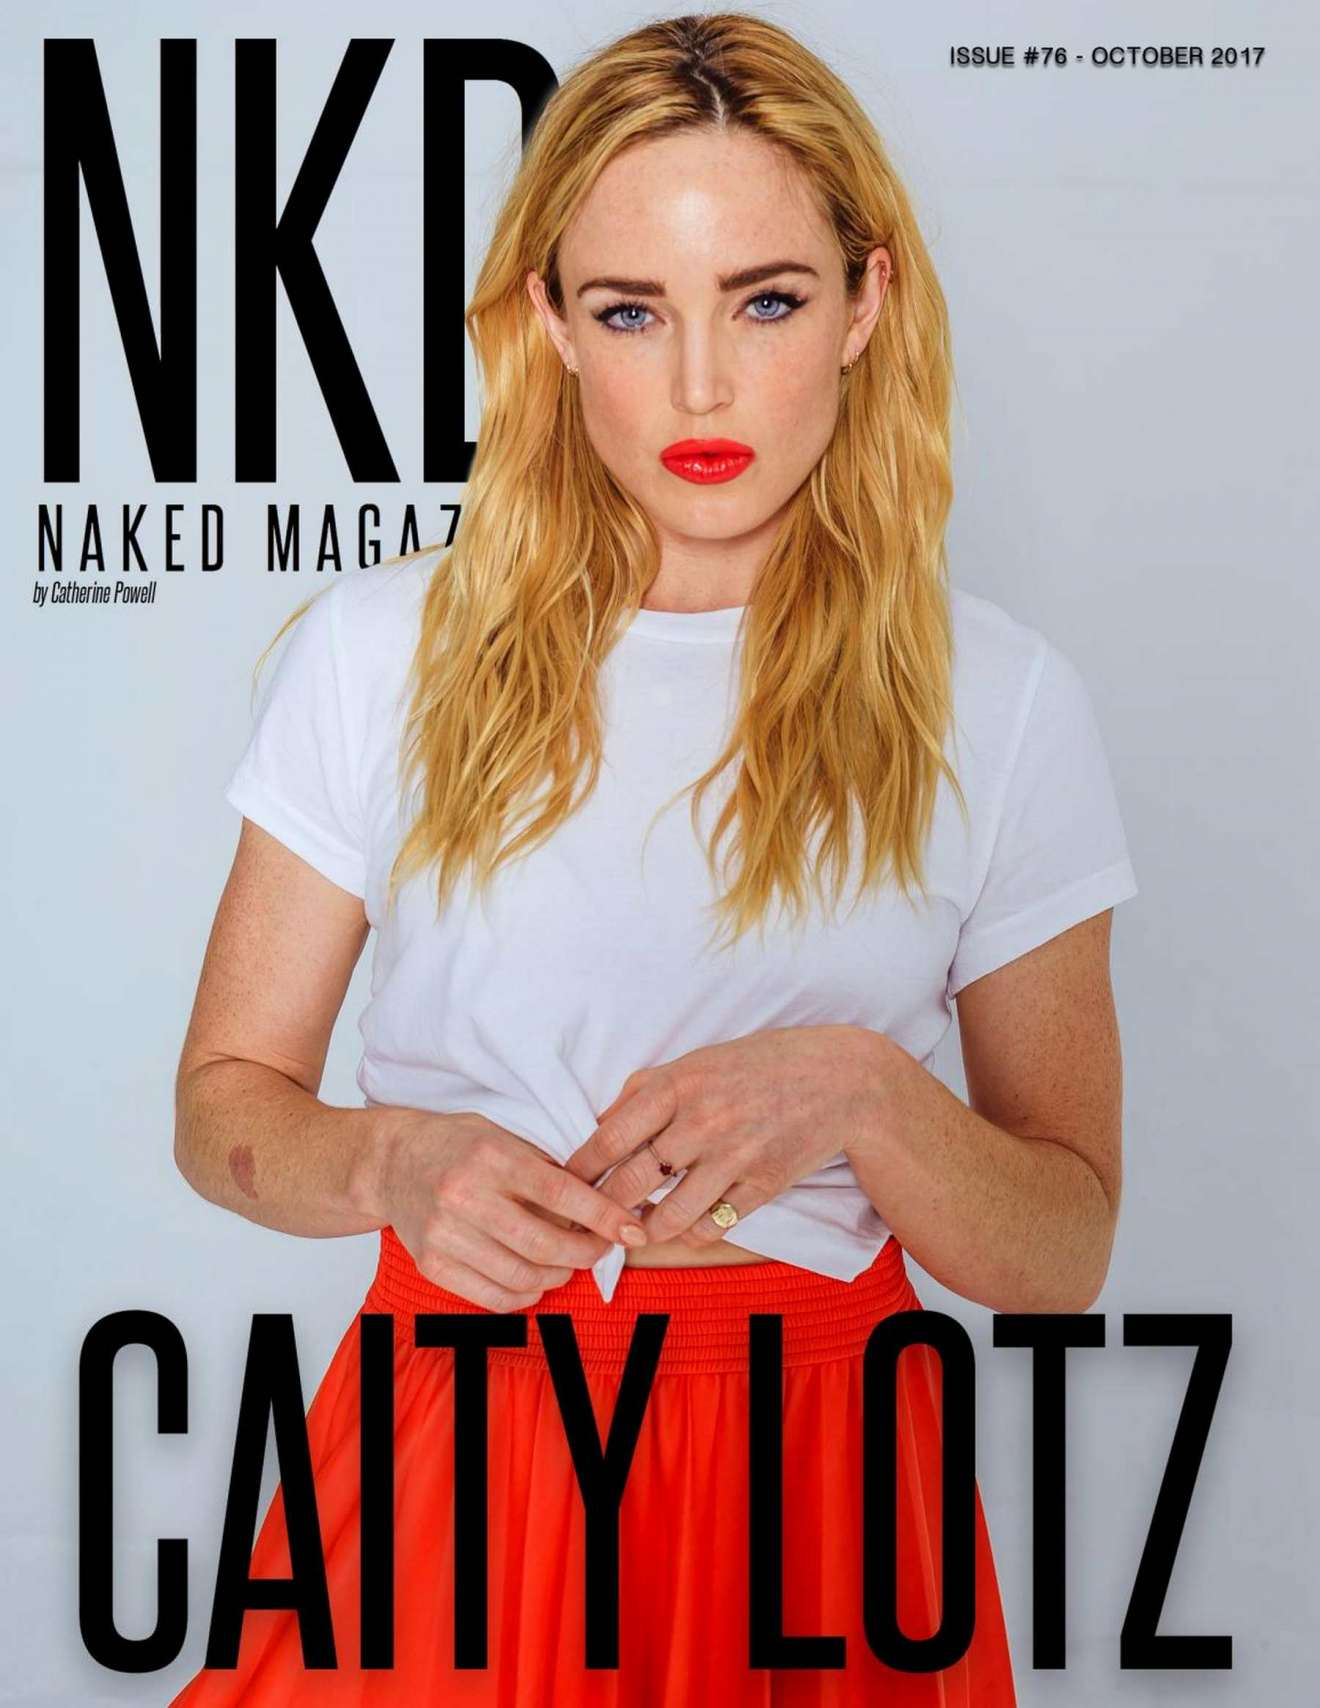 Caity Lotz – NKD Magazine Issue 76 by Catherine Powell